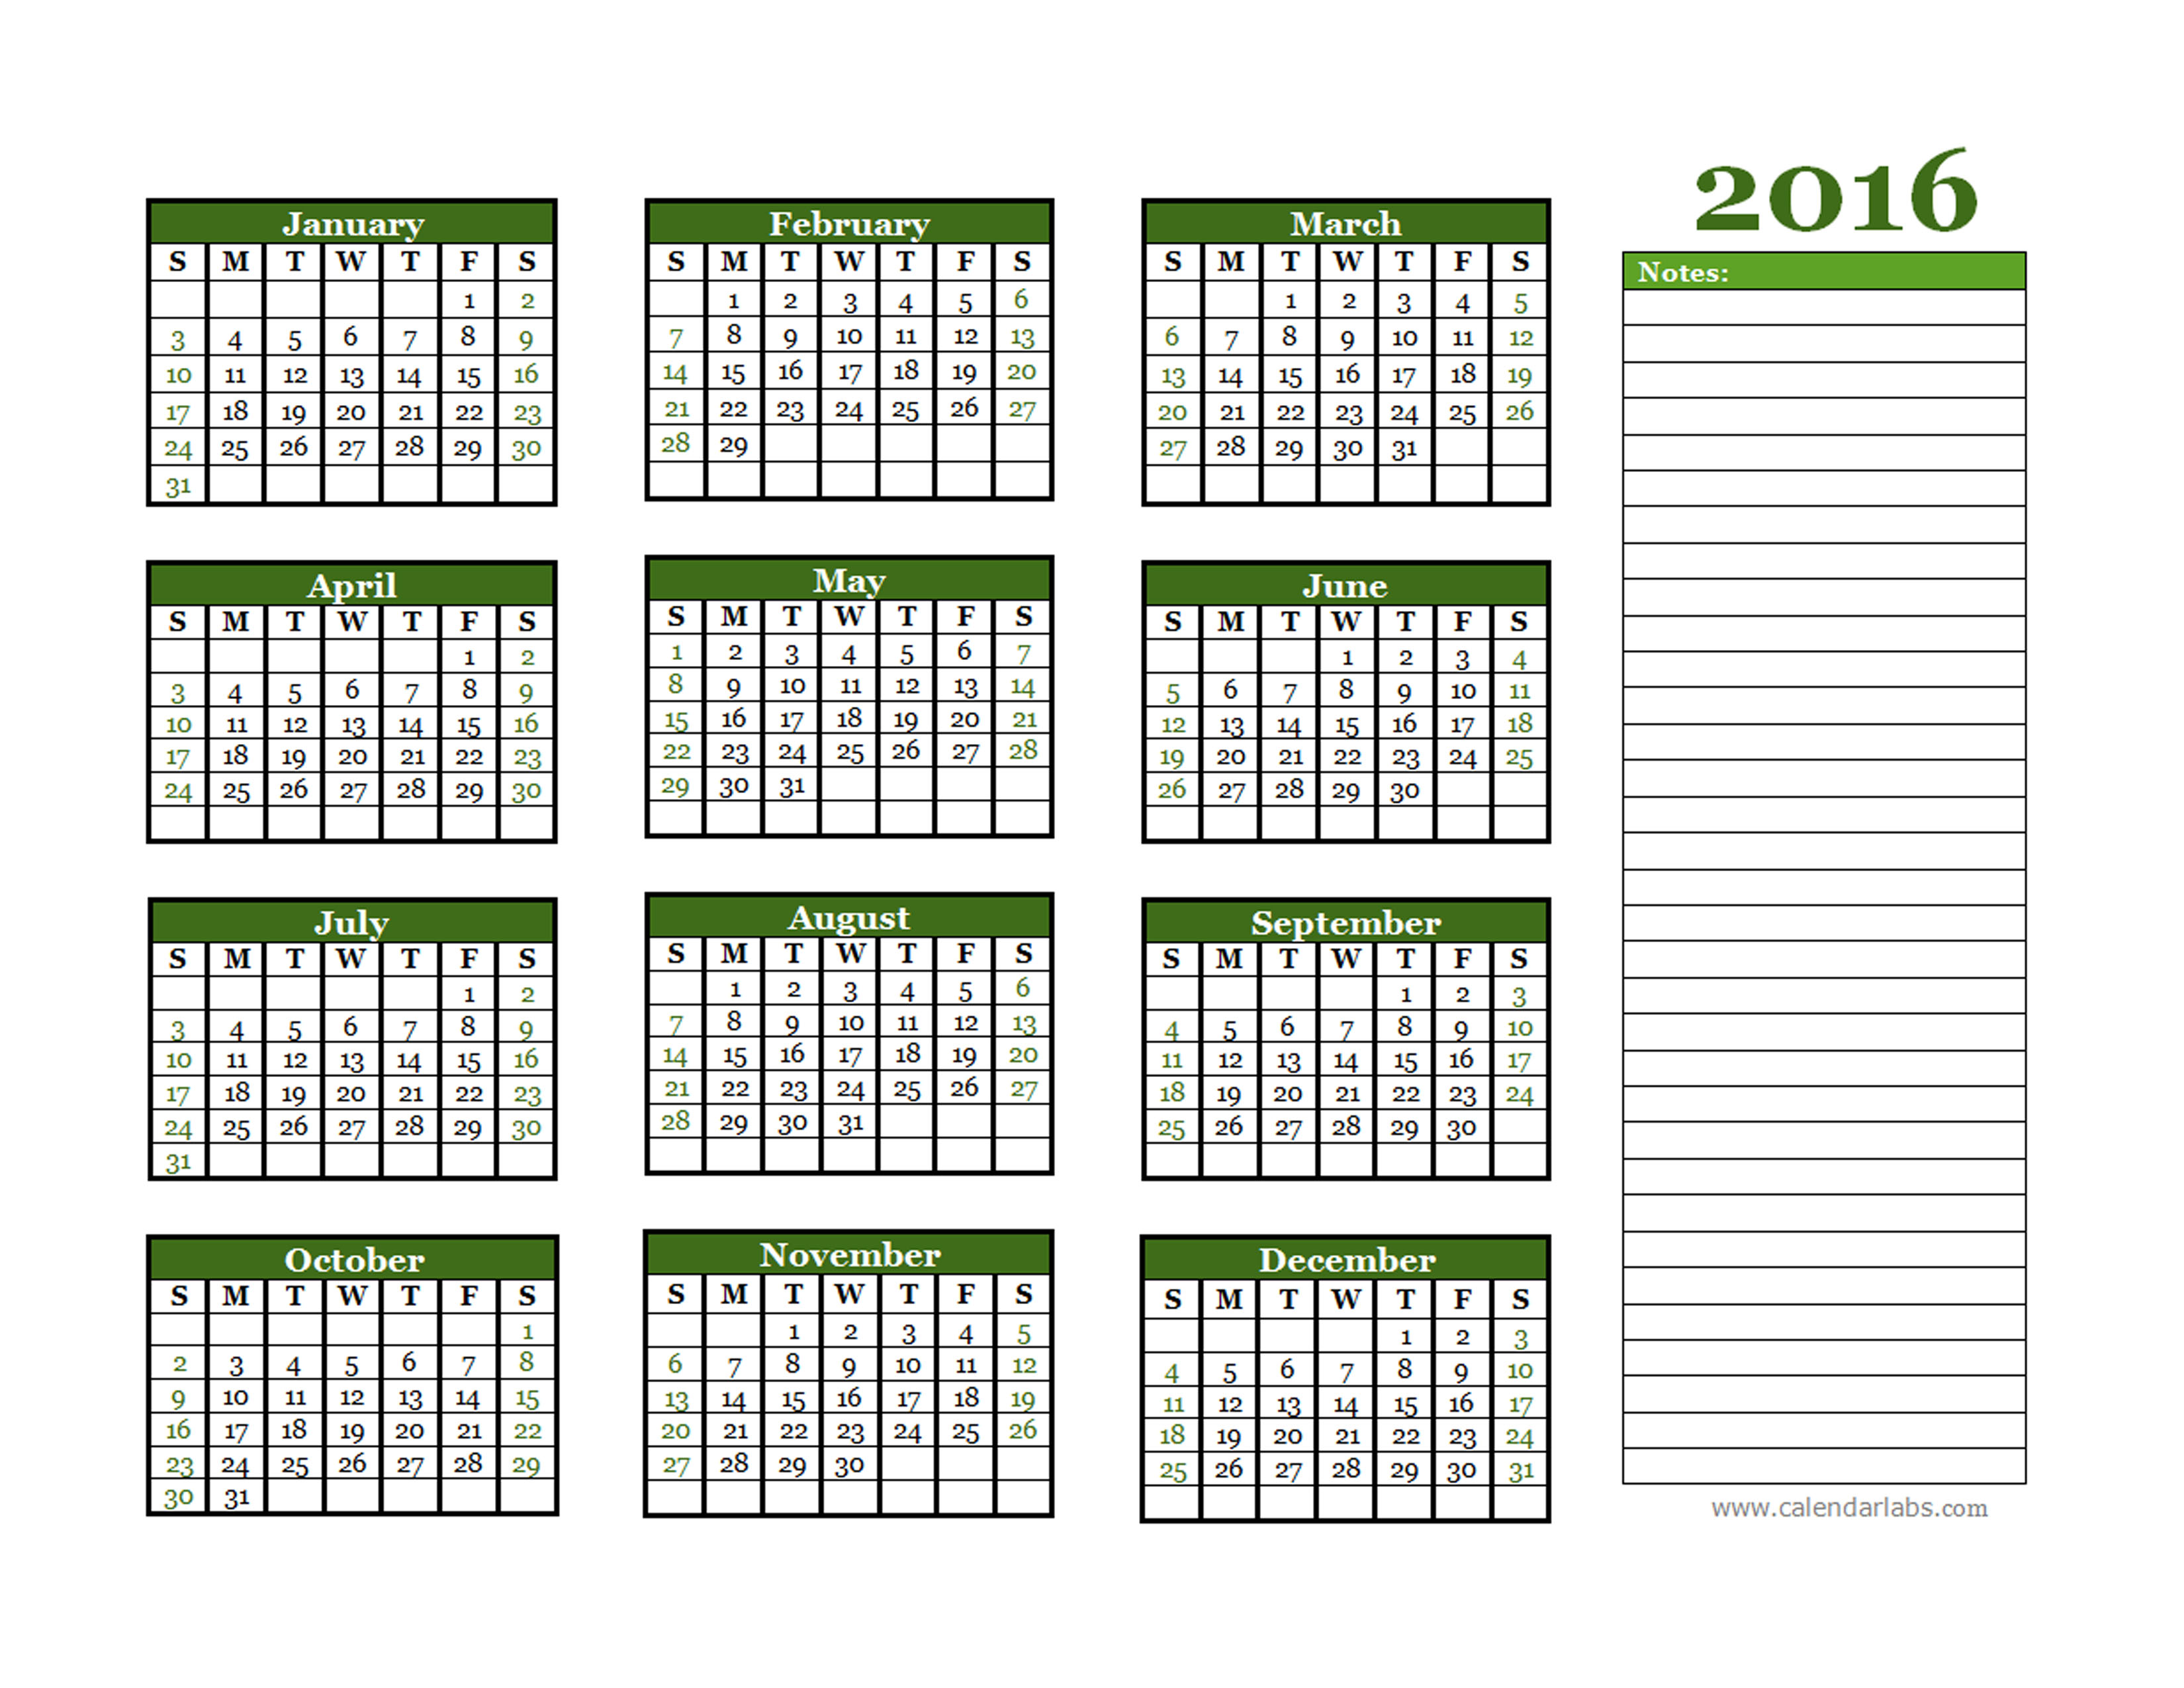 calendar labs for 2016 yearly calendar calendar template 2016